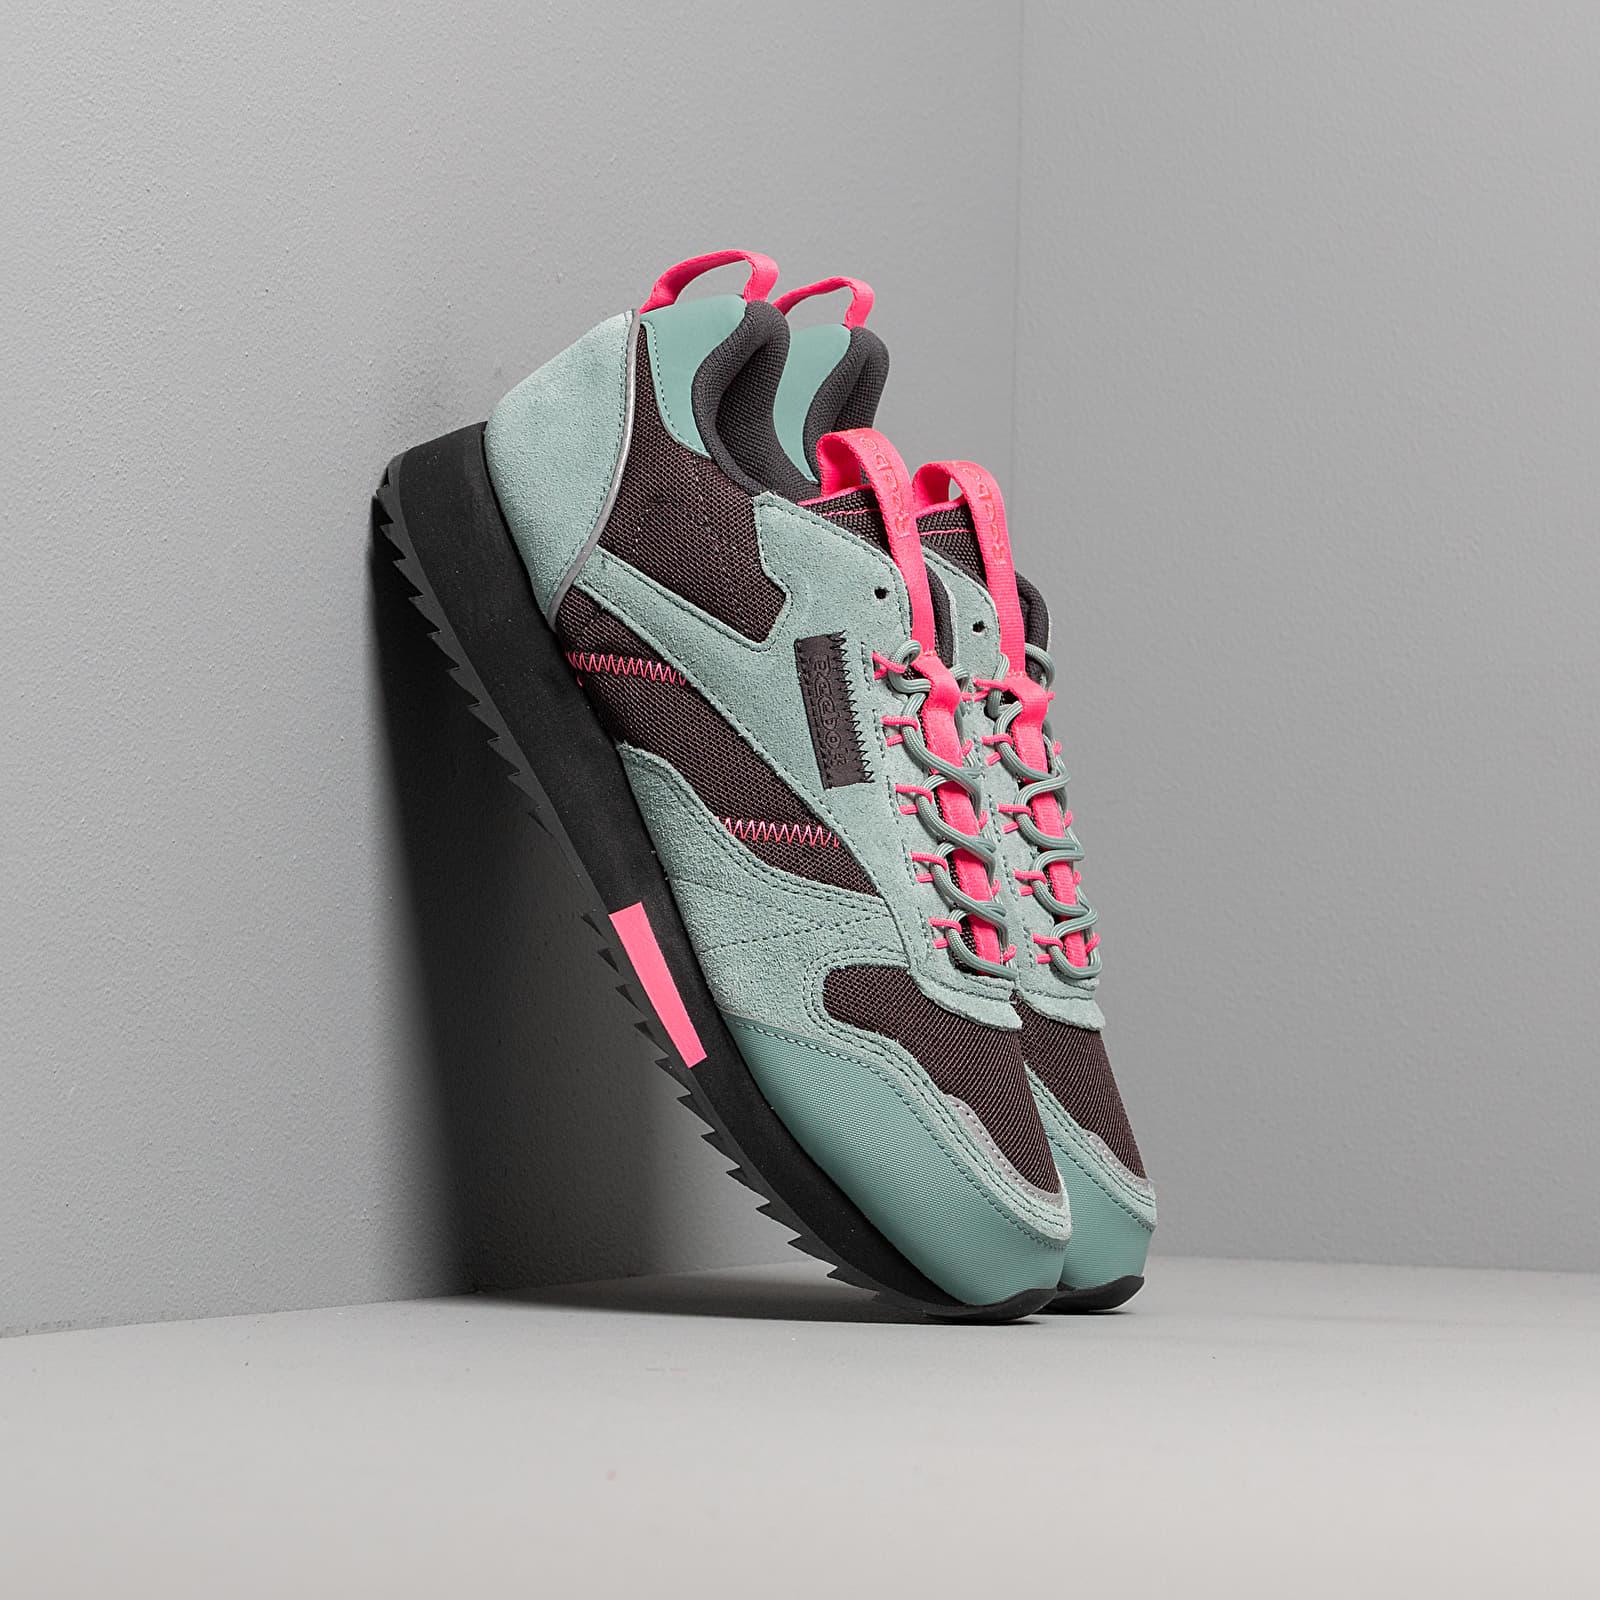 Reebok Classic Leather Ripple Trail Green Slate True Grey 8 Solar Pink | Footshop